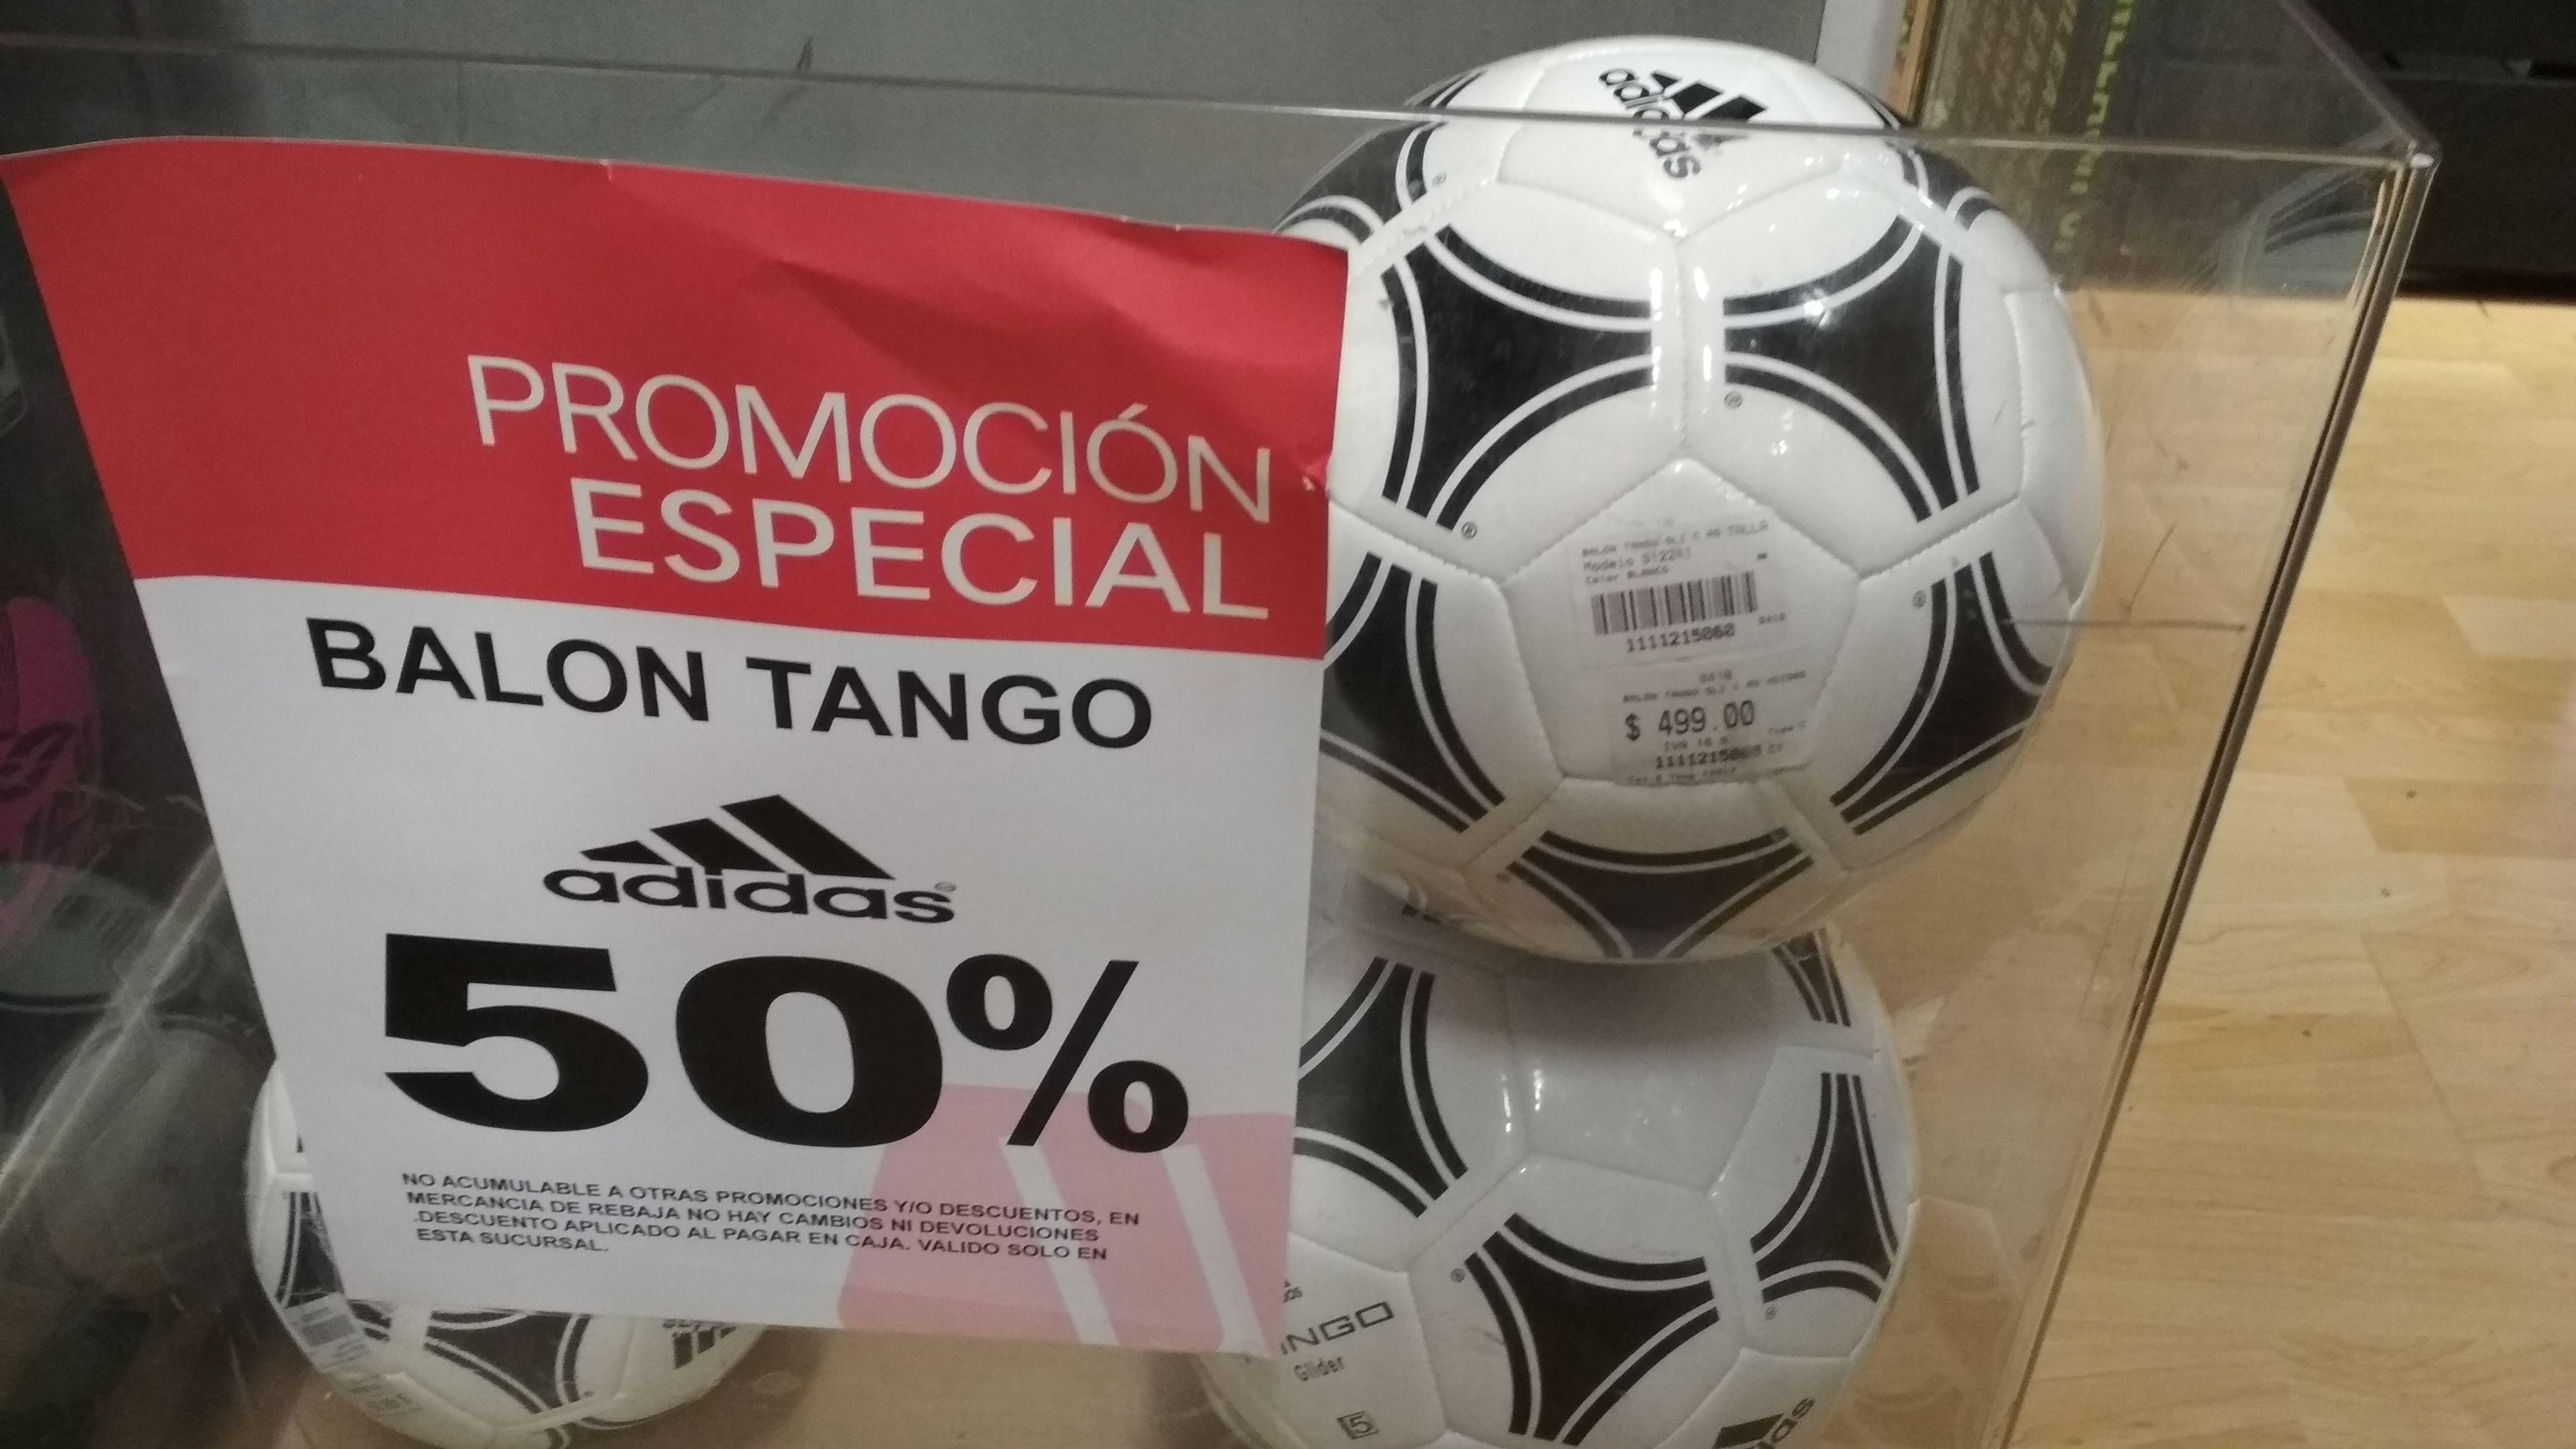 Martí CDMX: Balón Adidas Tango